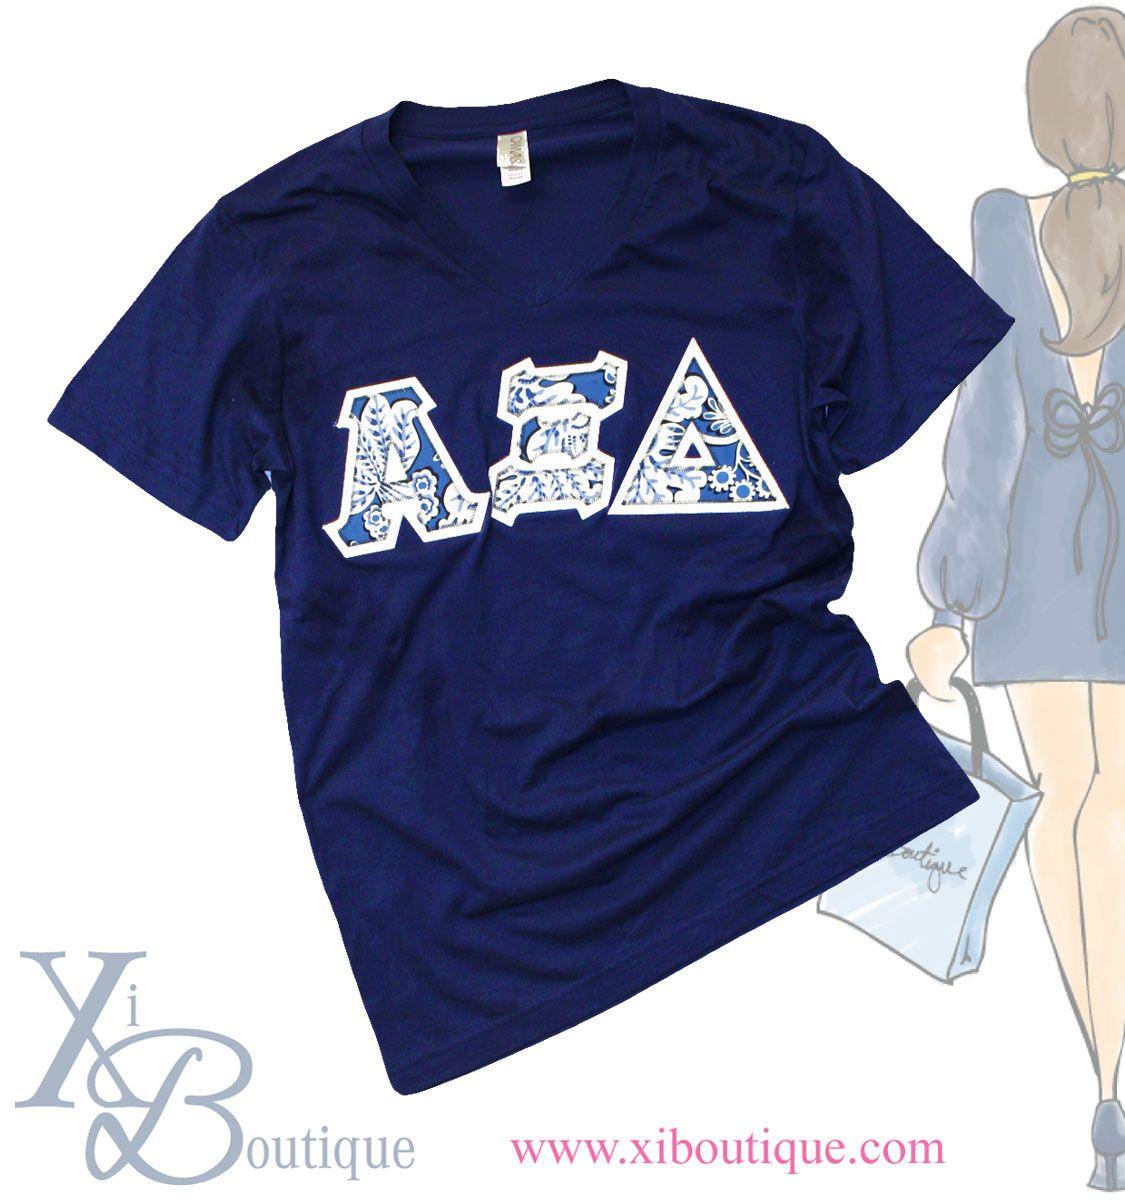 vera bradley blue lagoon print stitch letter alpha xi delta t shirt xiboutiquecom